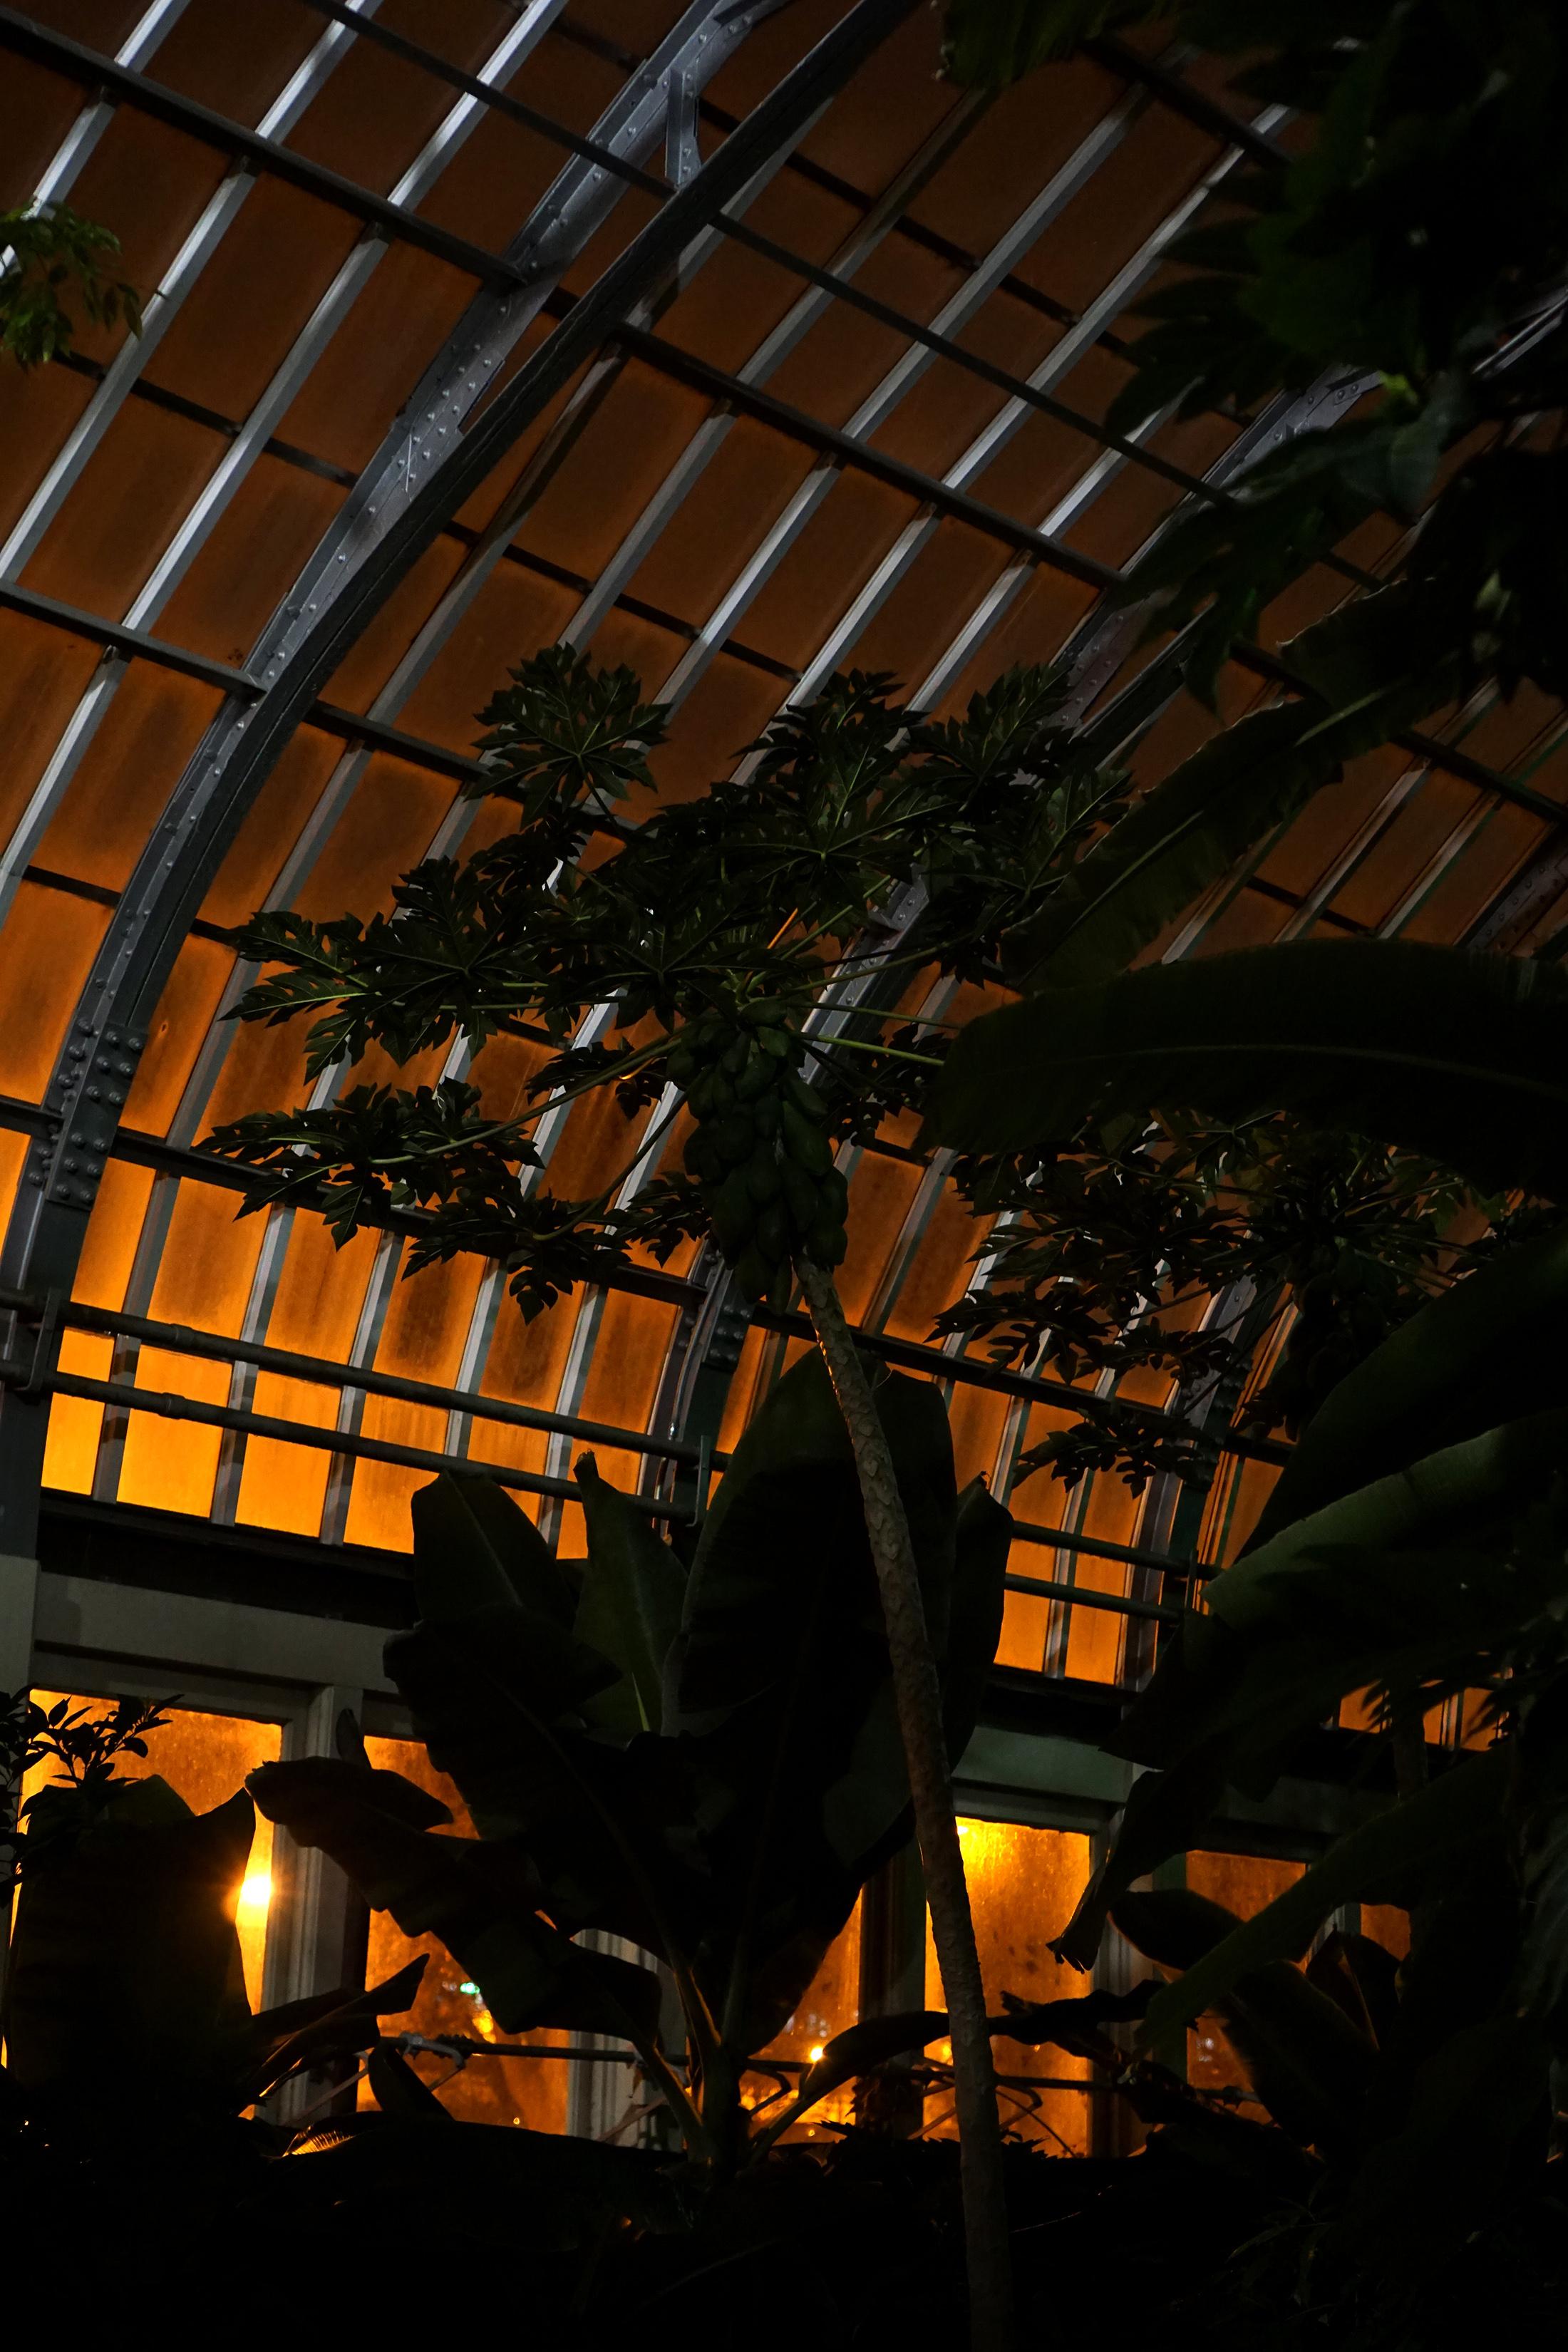 Papaya plant backlit, Garfield Park Conservatory at night, Chicago / Darker than Green